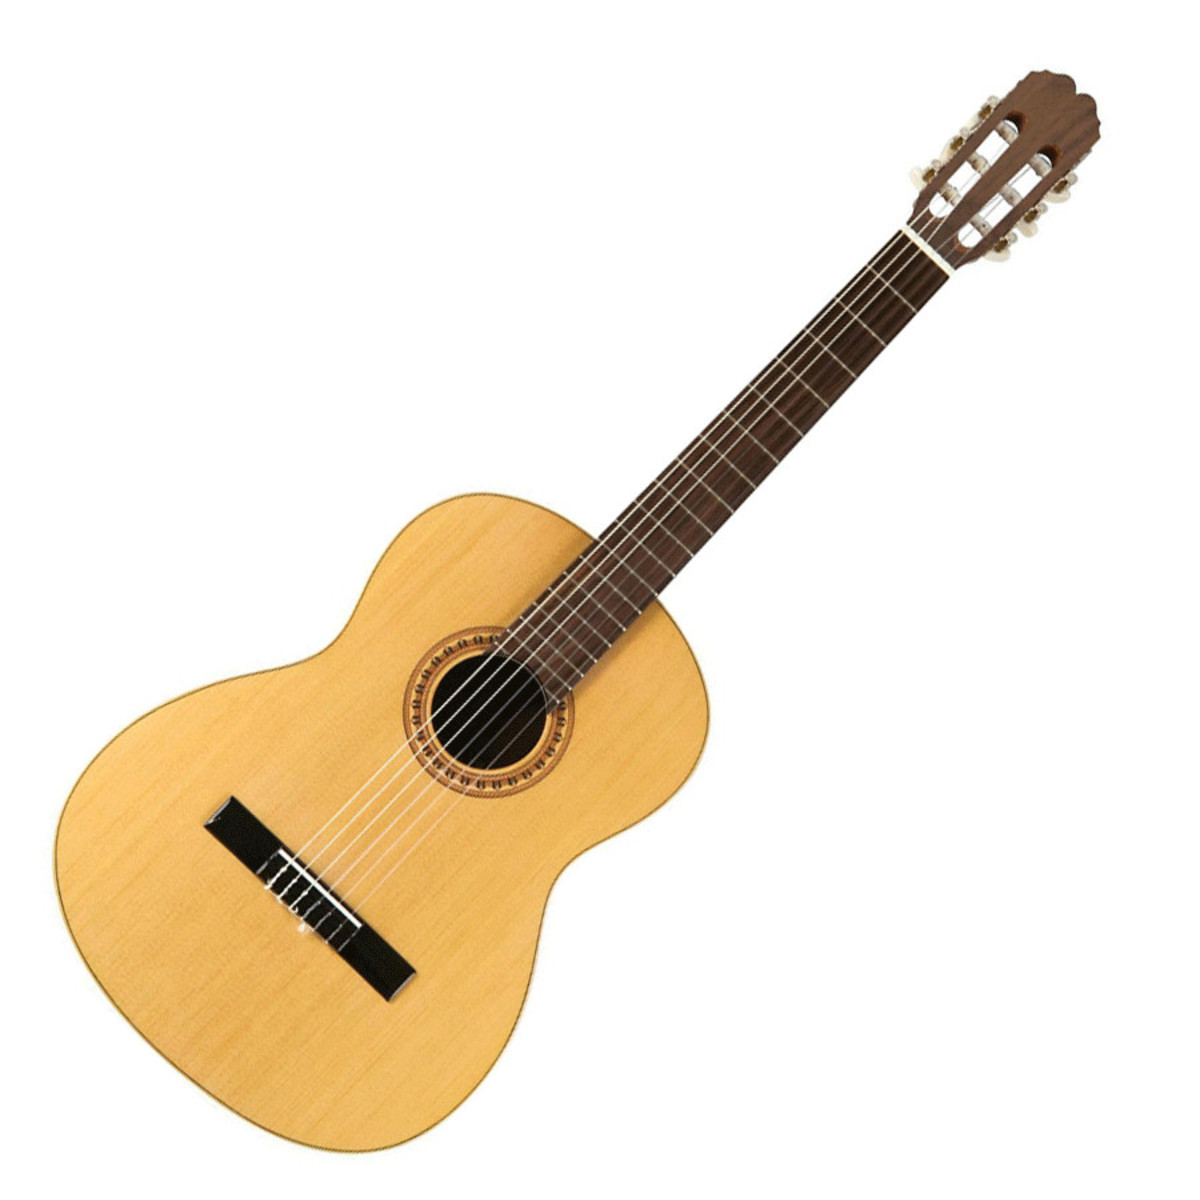 Manuel rodriguez model 10 caballero guitar at for Guitarras de luthier